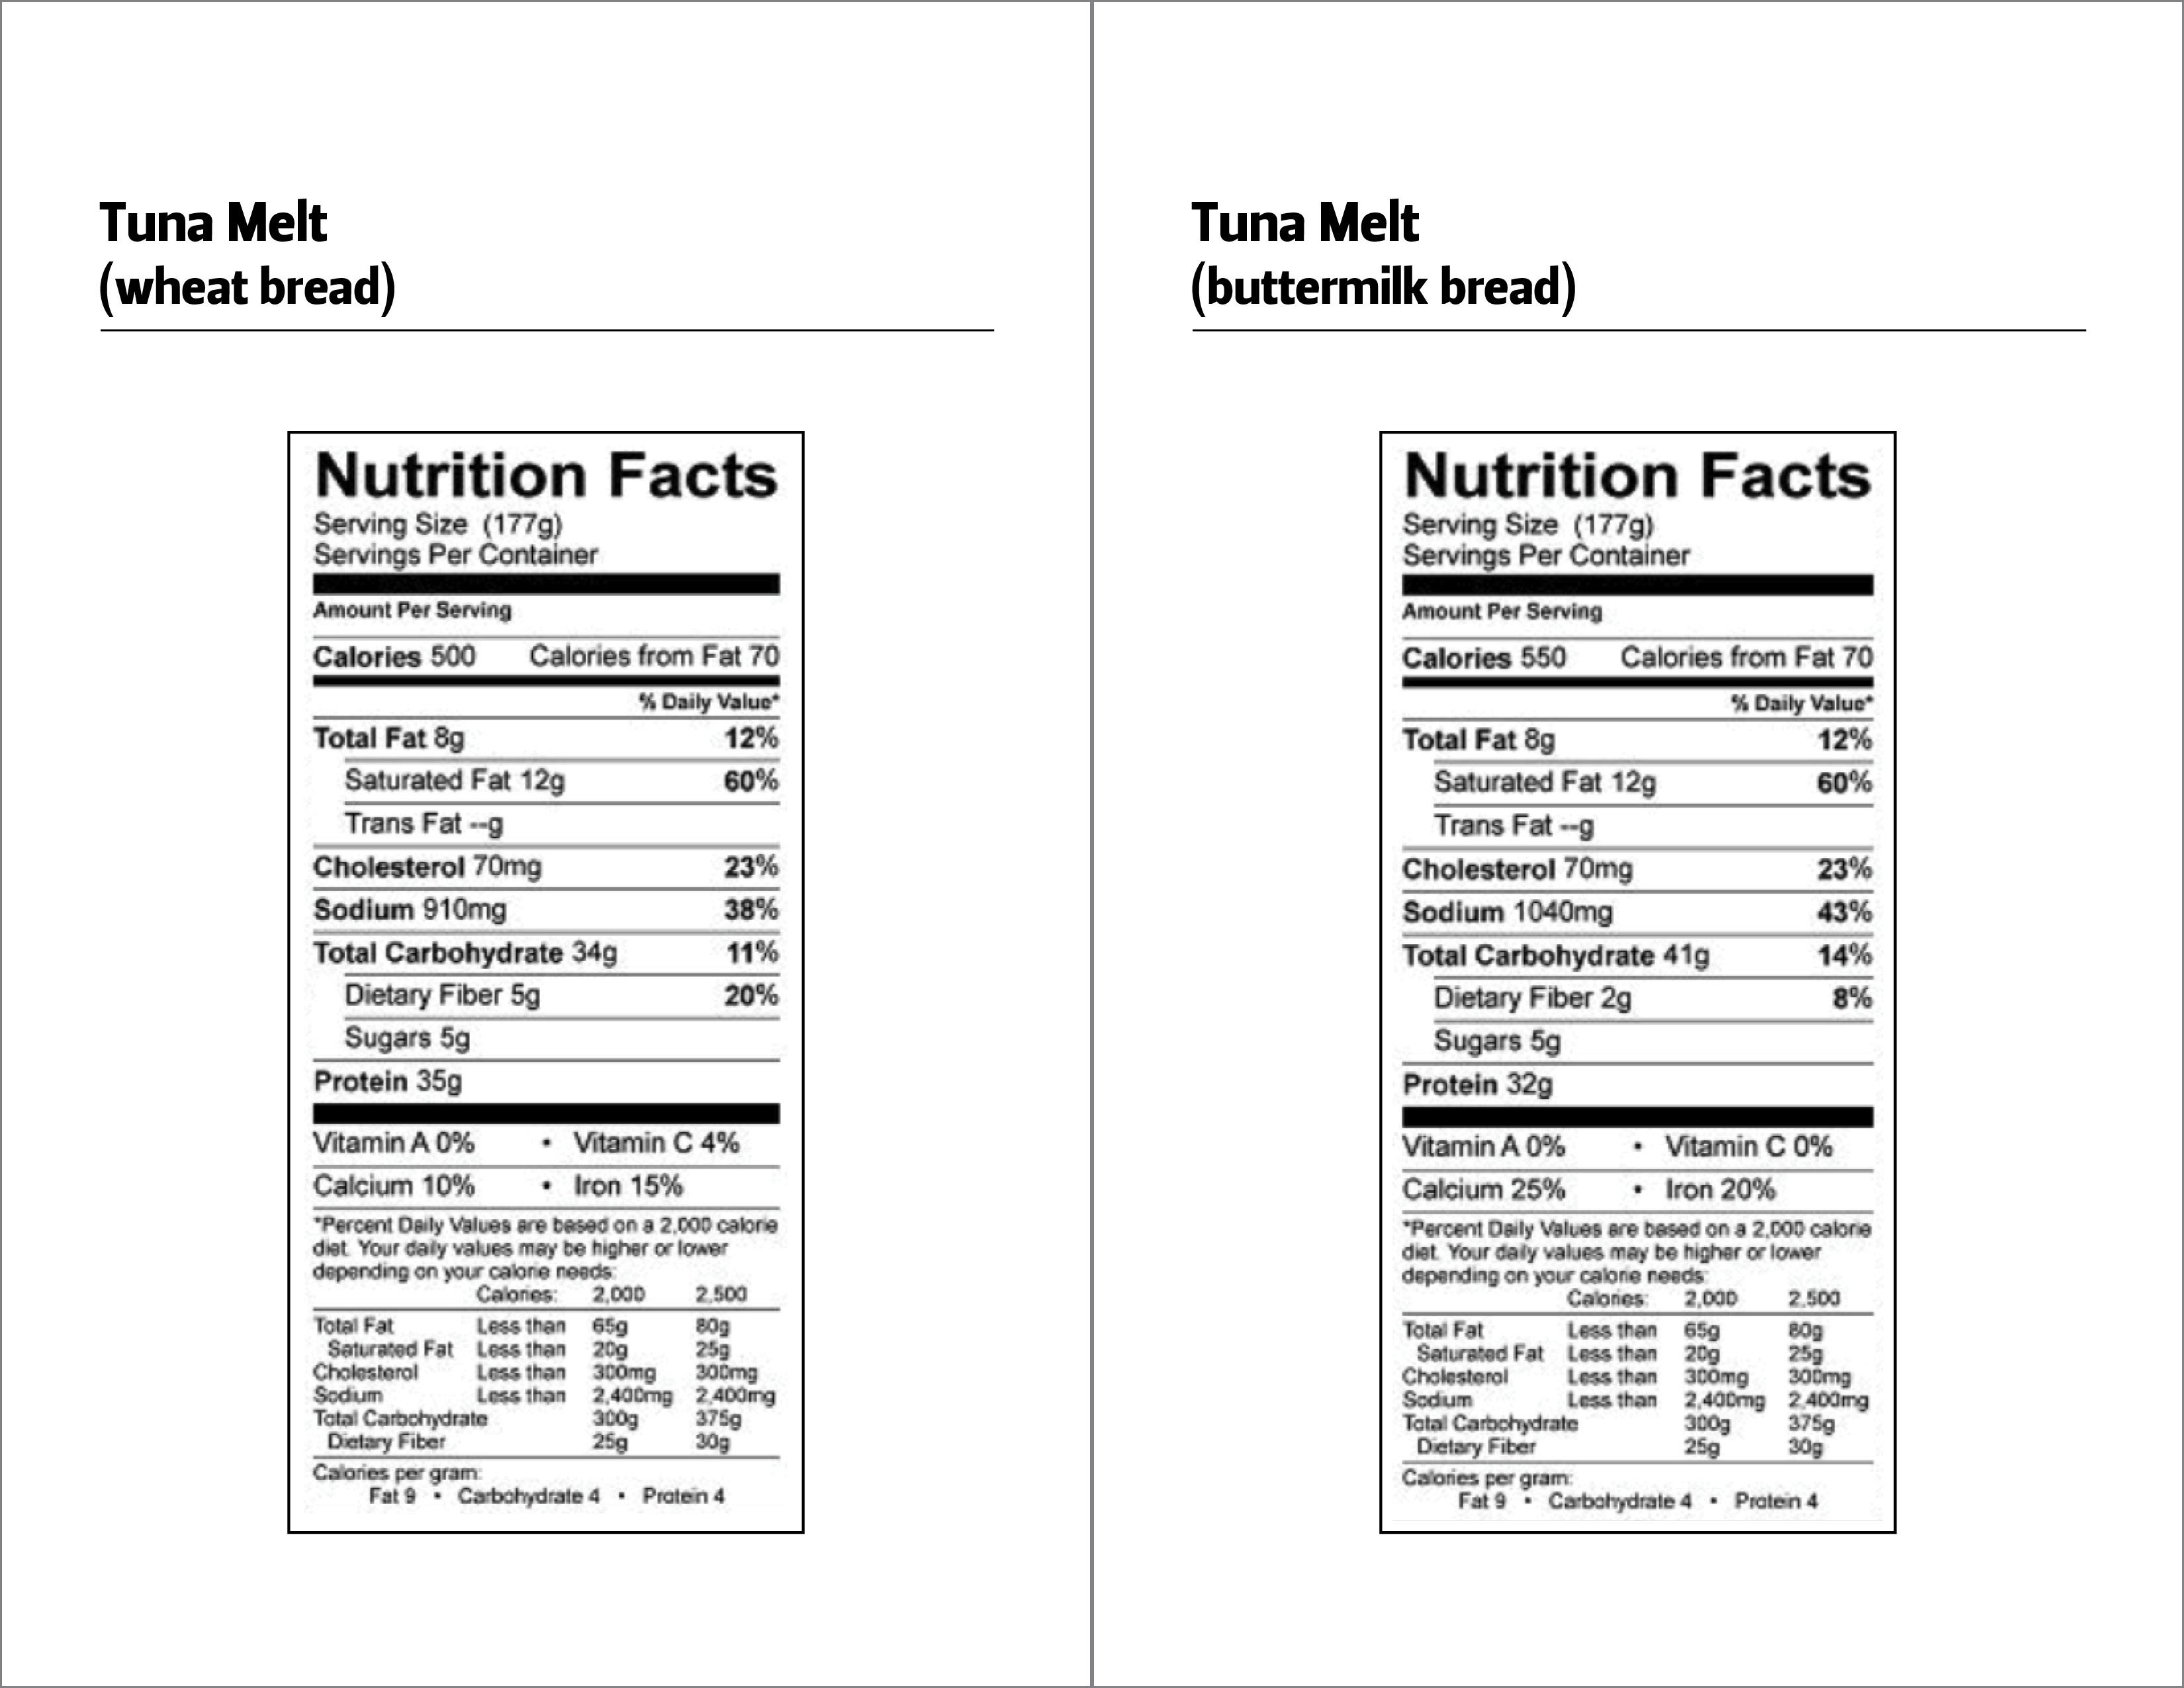 Nutritional information memorial union oregon state university tuna melt sisterspd